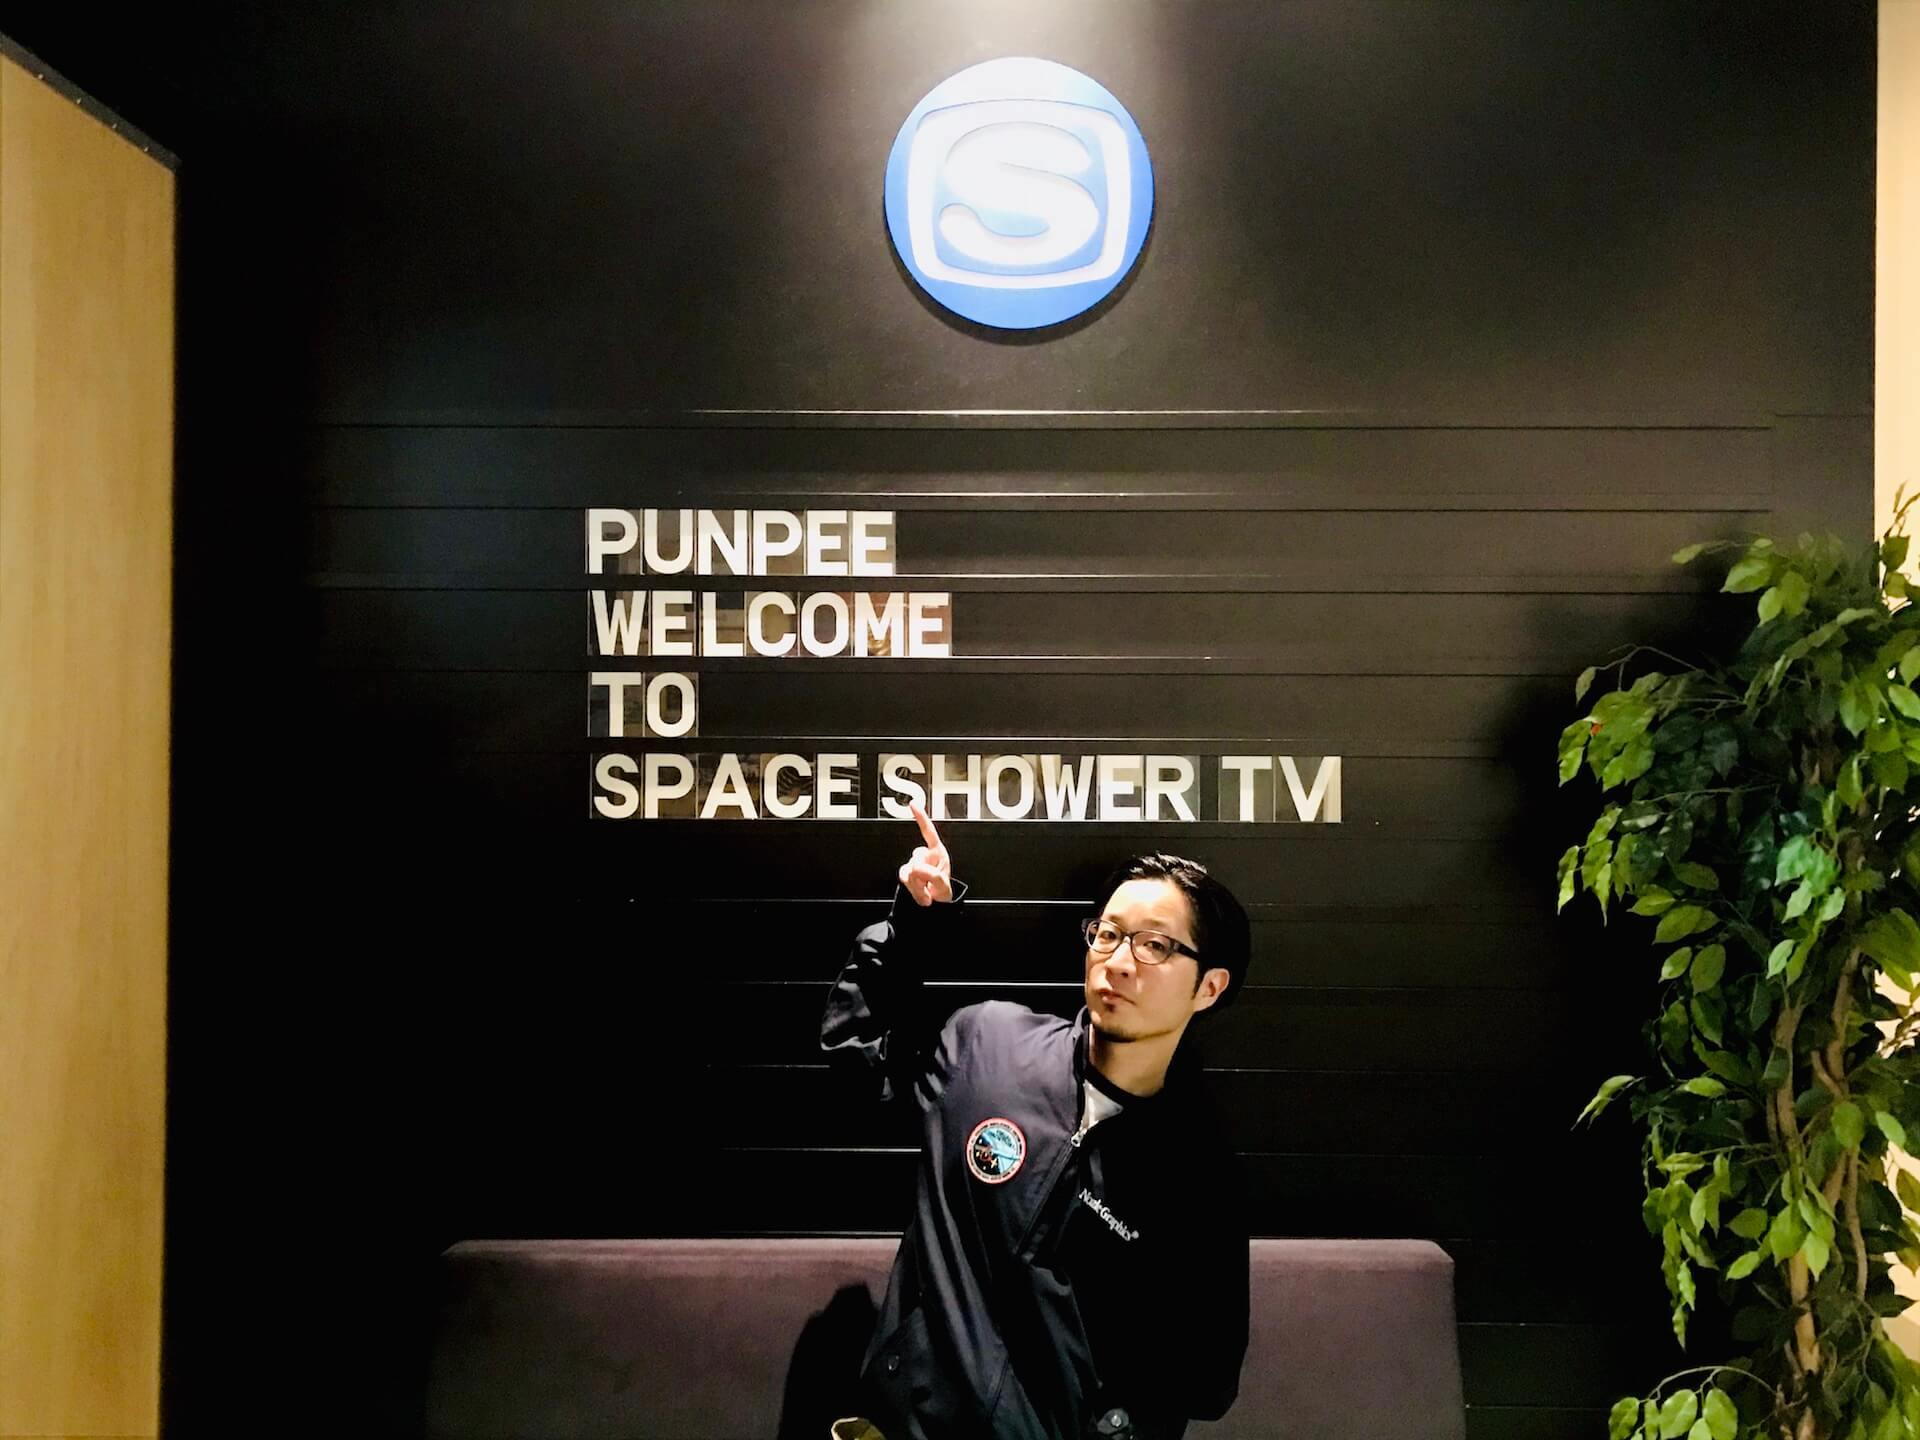 PUNPEEが生配信ライブ<PUNPEE Sofa Kingdomcom>を徹底解説!スペースシャワーTVにてディテールを語るトーク番組が放送決定 music201102_punpee_live_3